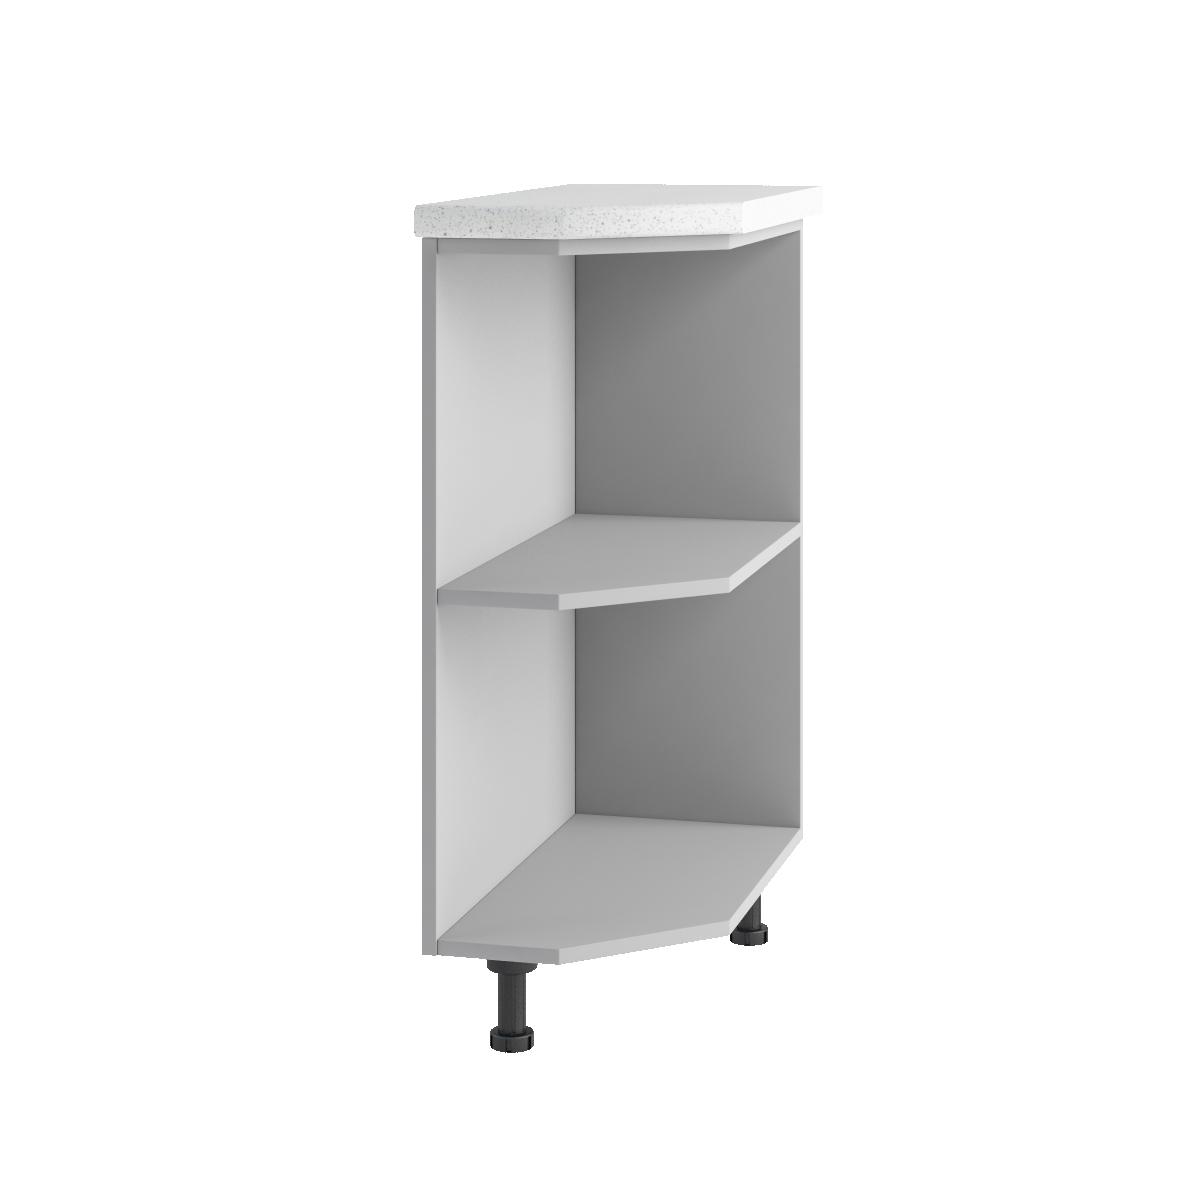 Кухня Монако СТУ 300 Шкаф нижний угловой Л/П